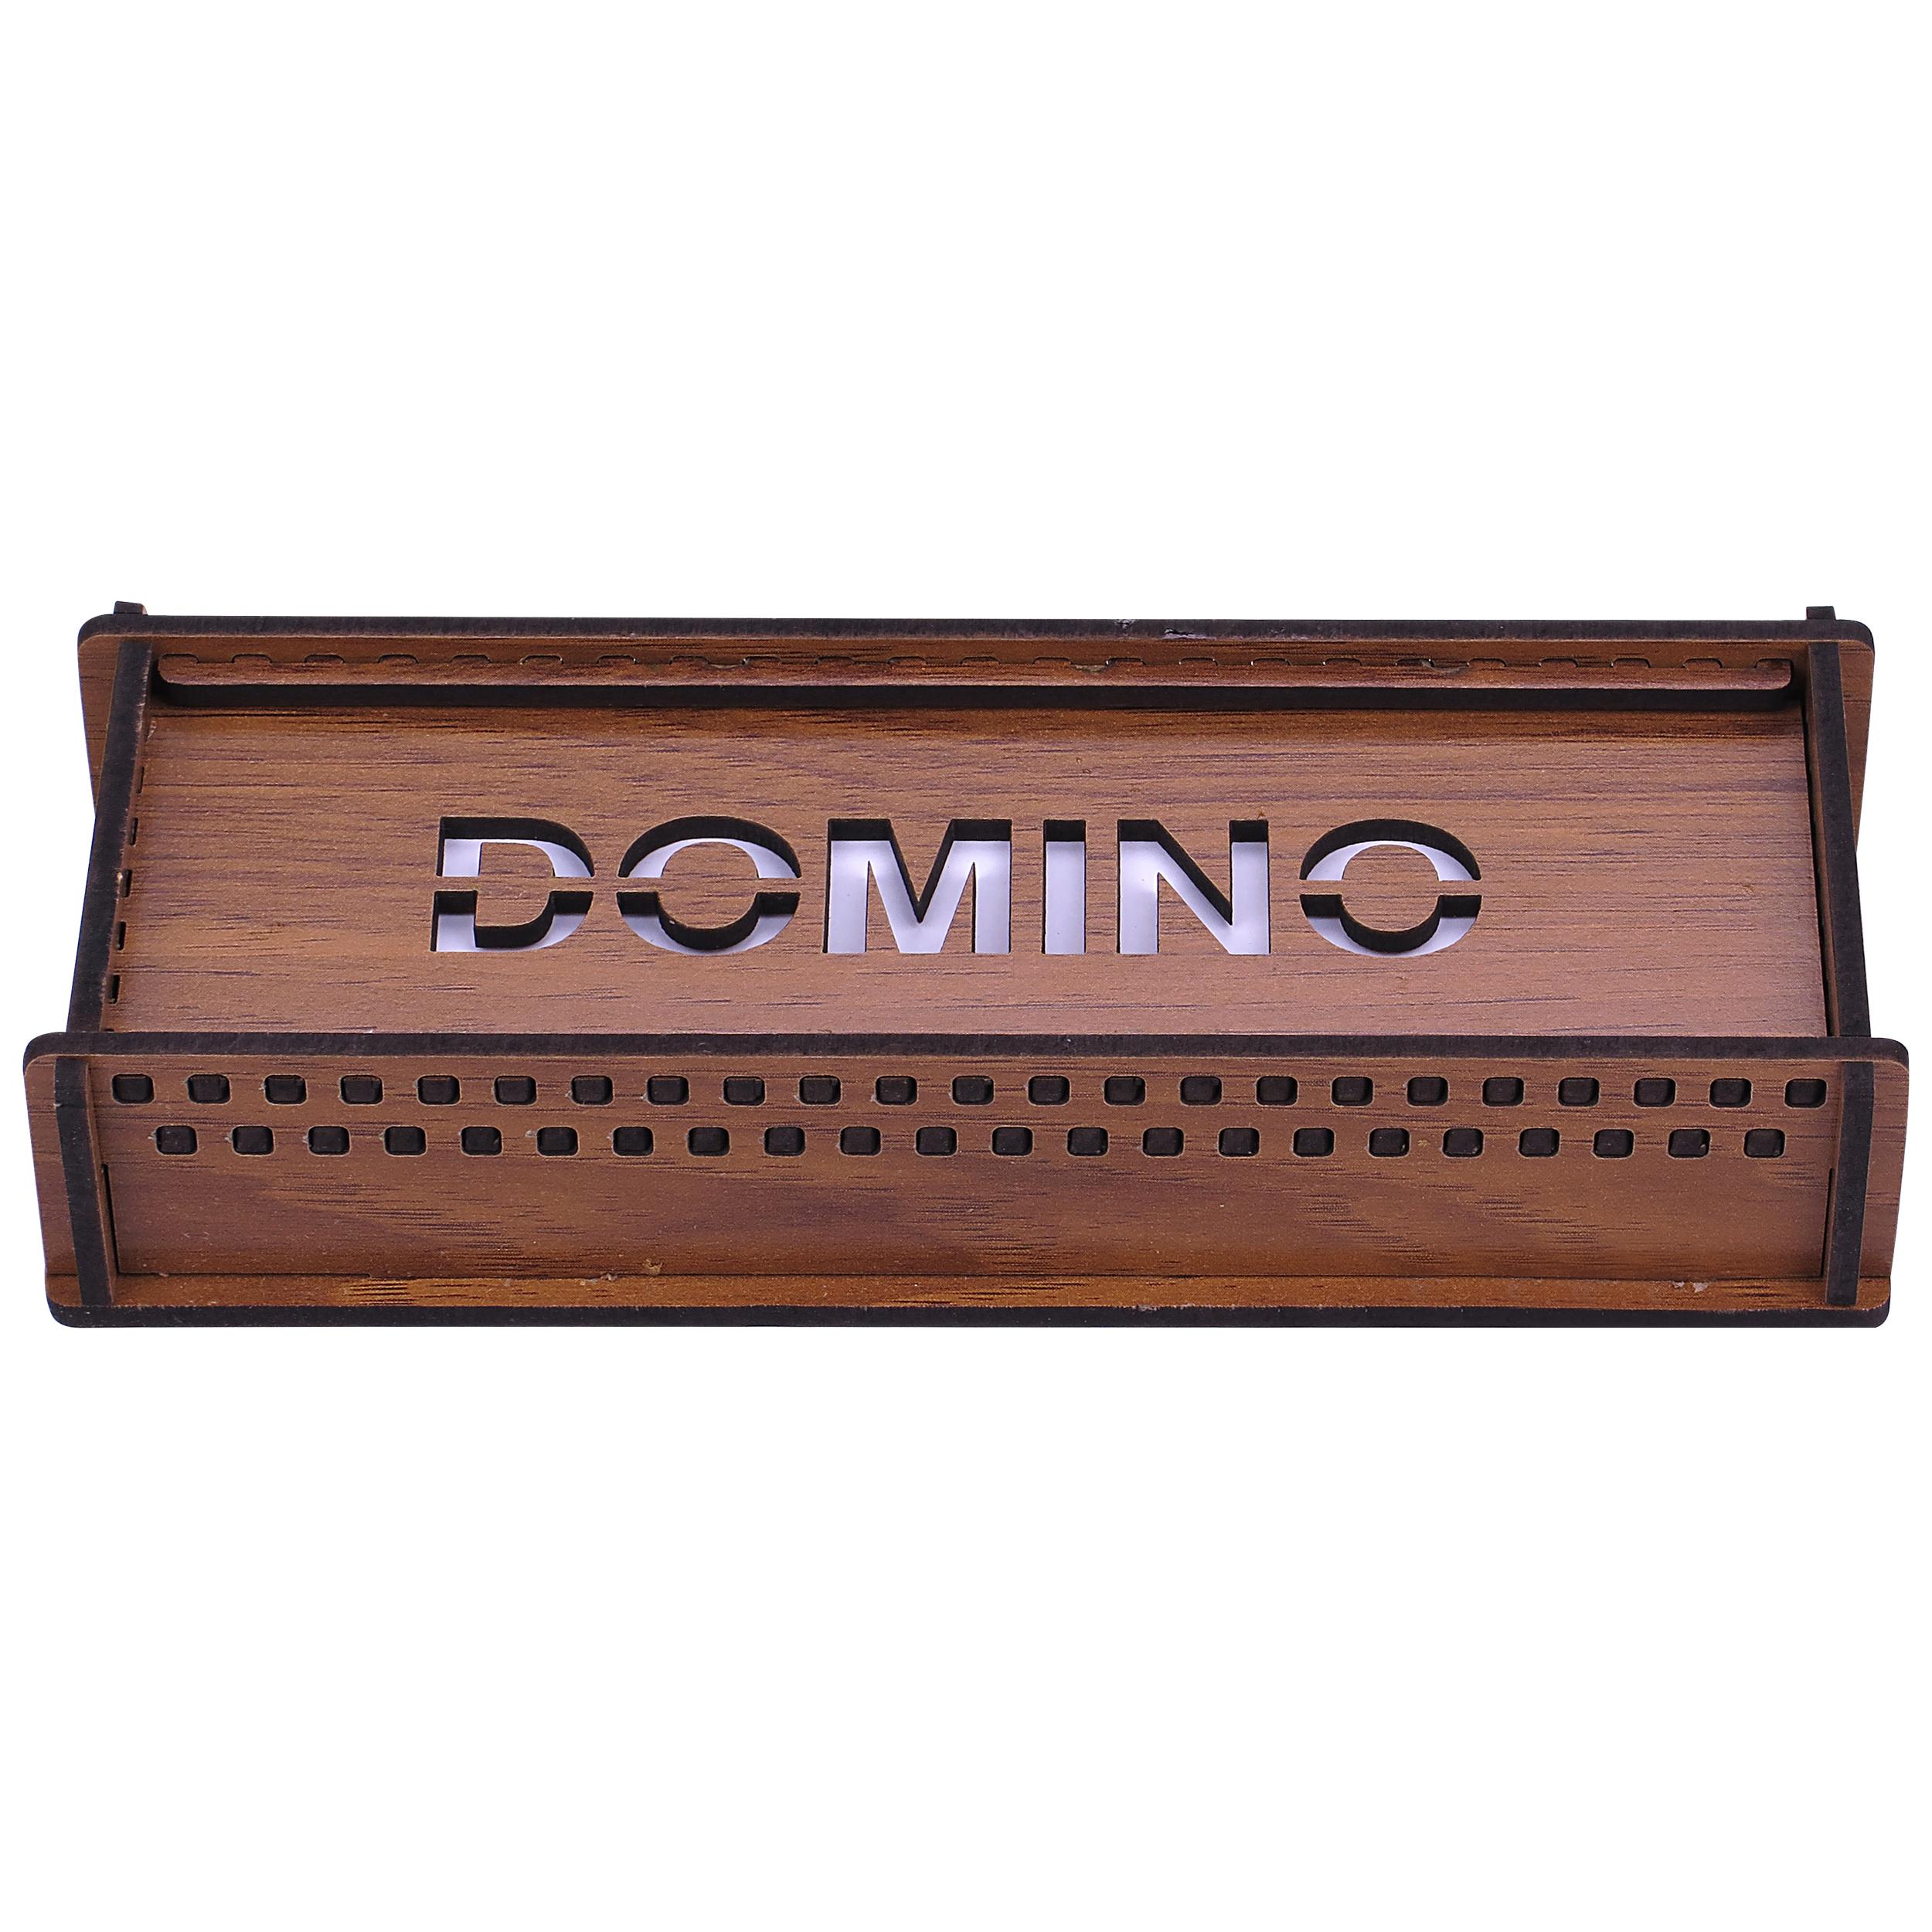 بازی فکری دومینو کد BT123